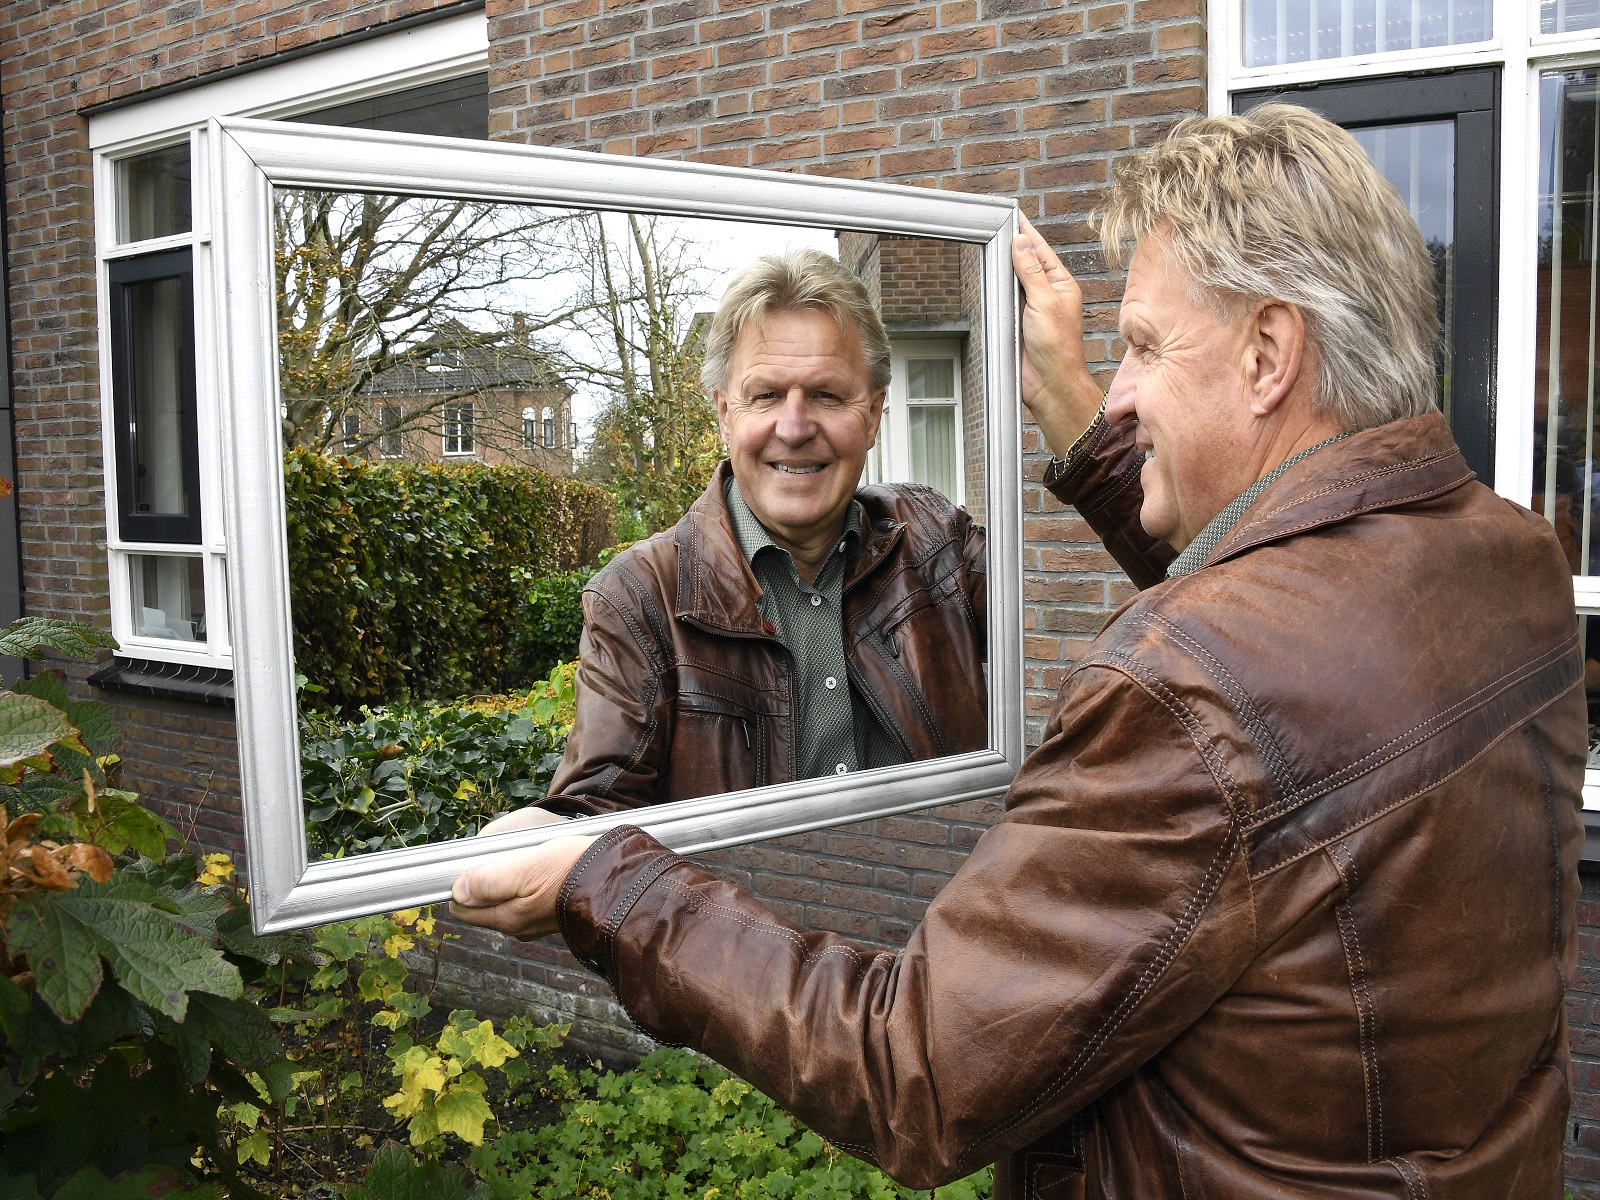 Jaap-Bond-in-de-spiegel-greenport-stories